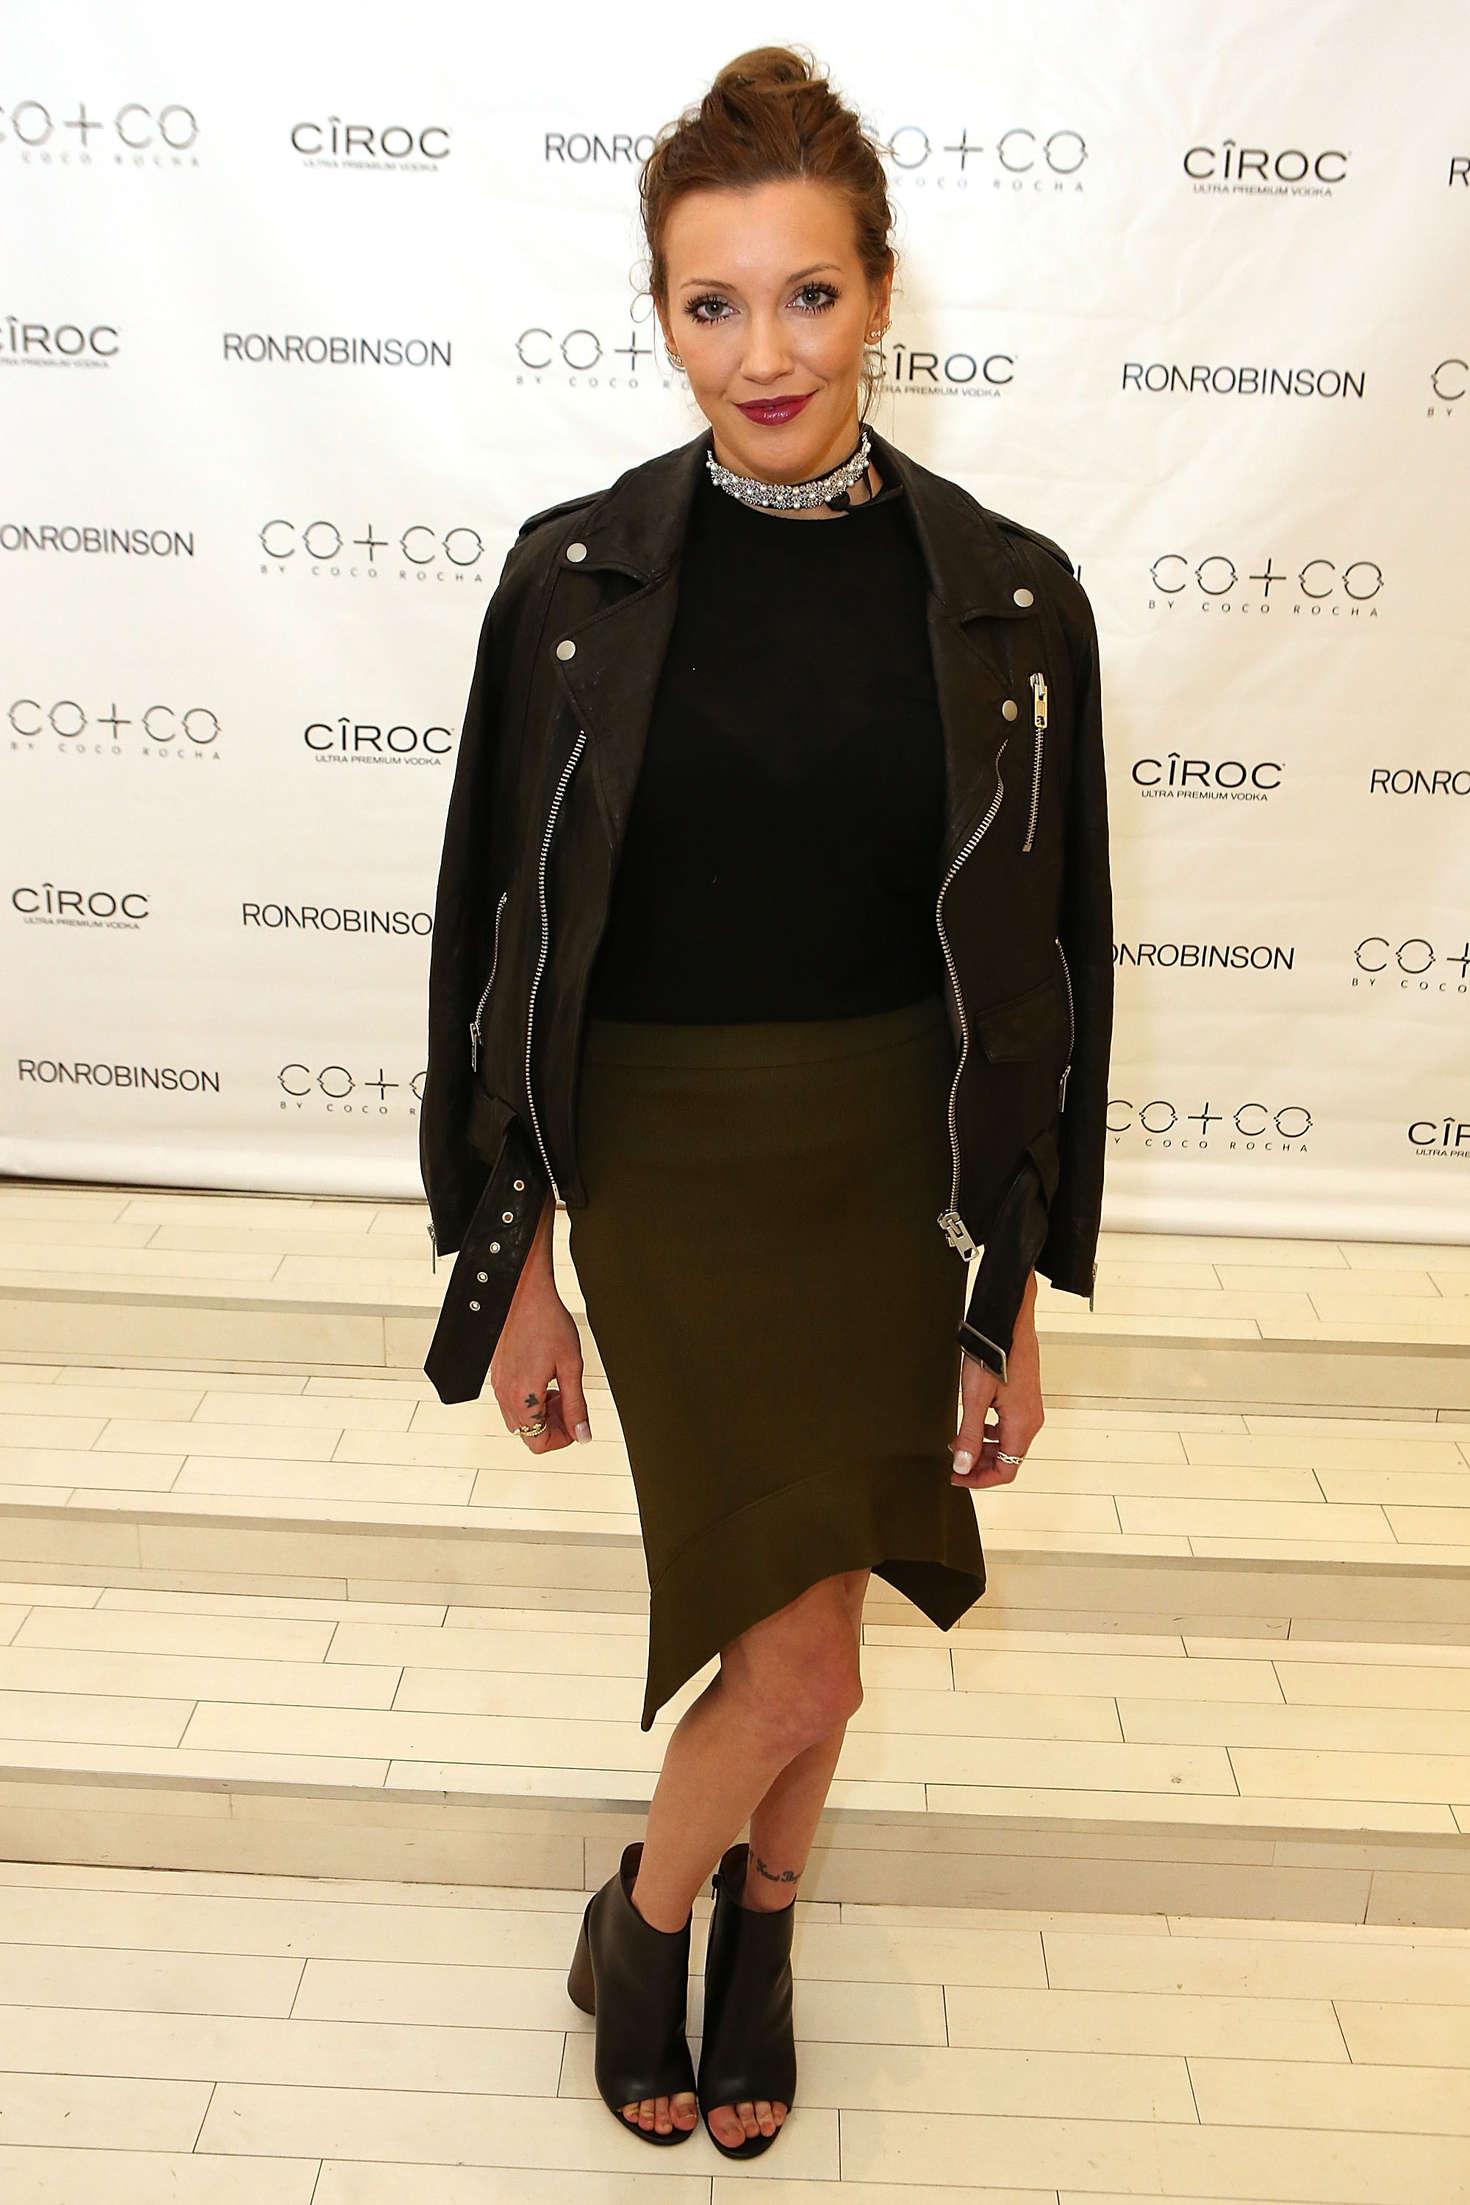 Katie Cassidy RonRobinson x COCO By Coco Rocha Launch Party in Santa Monica